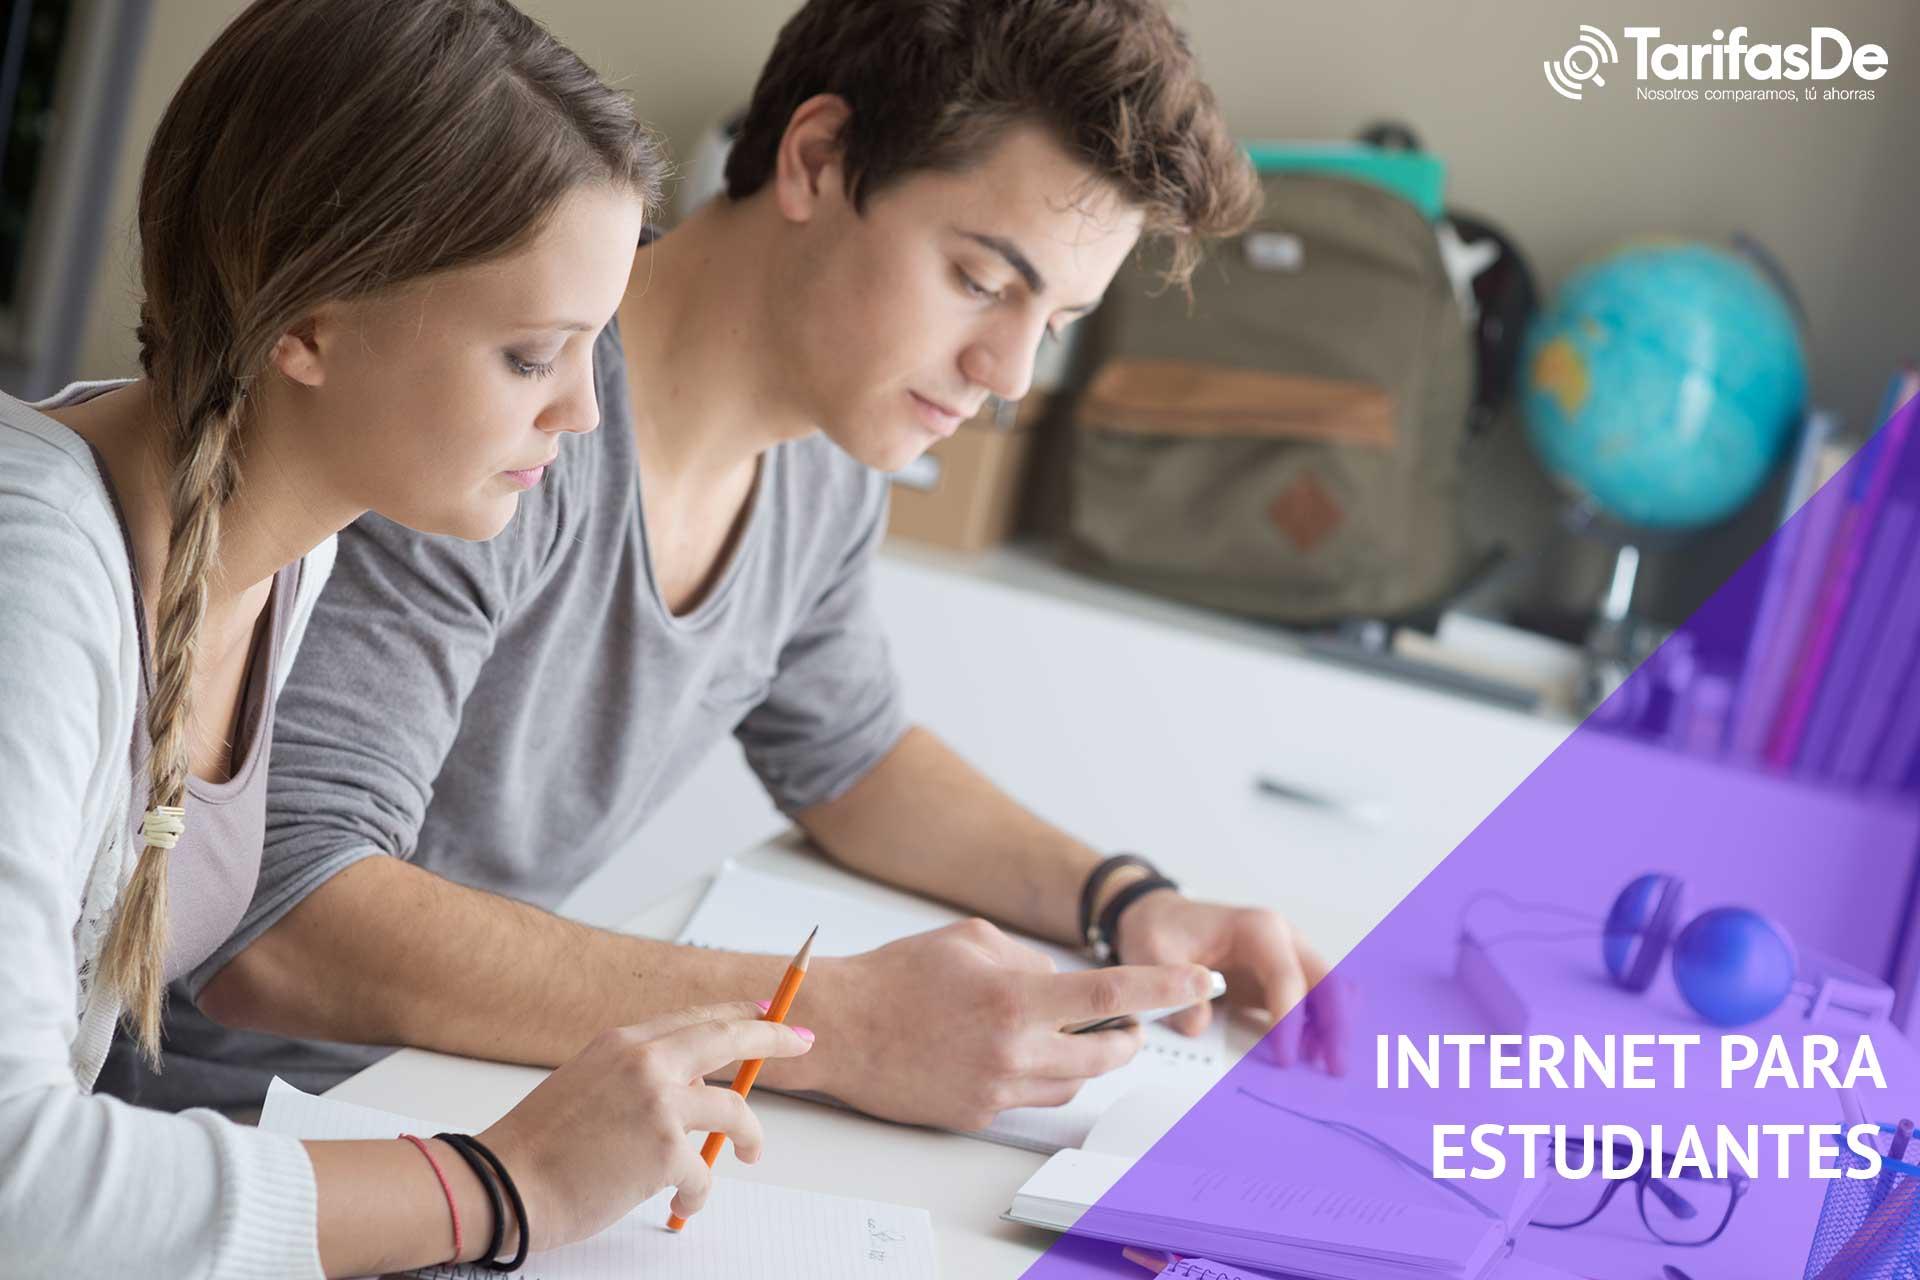 Internet para estudiantes 2020